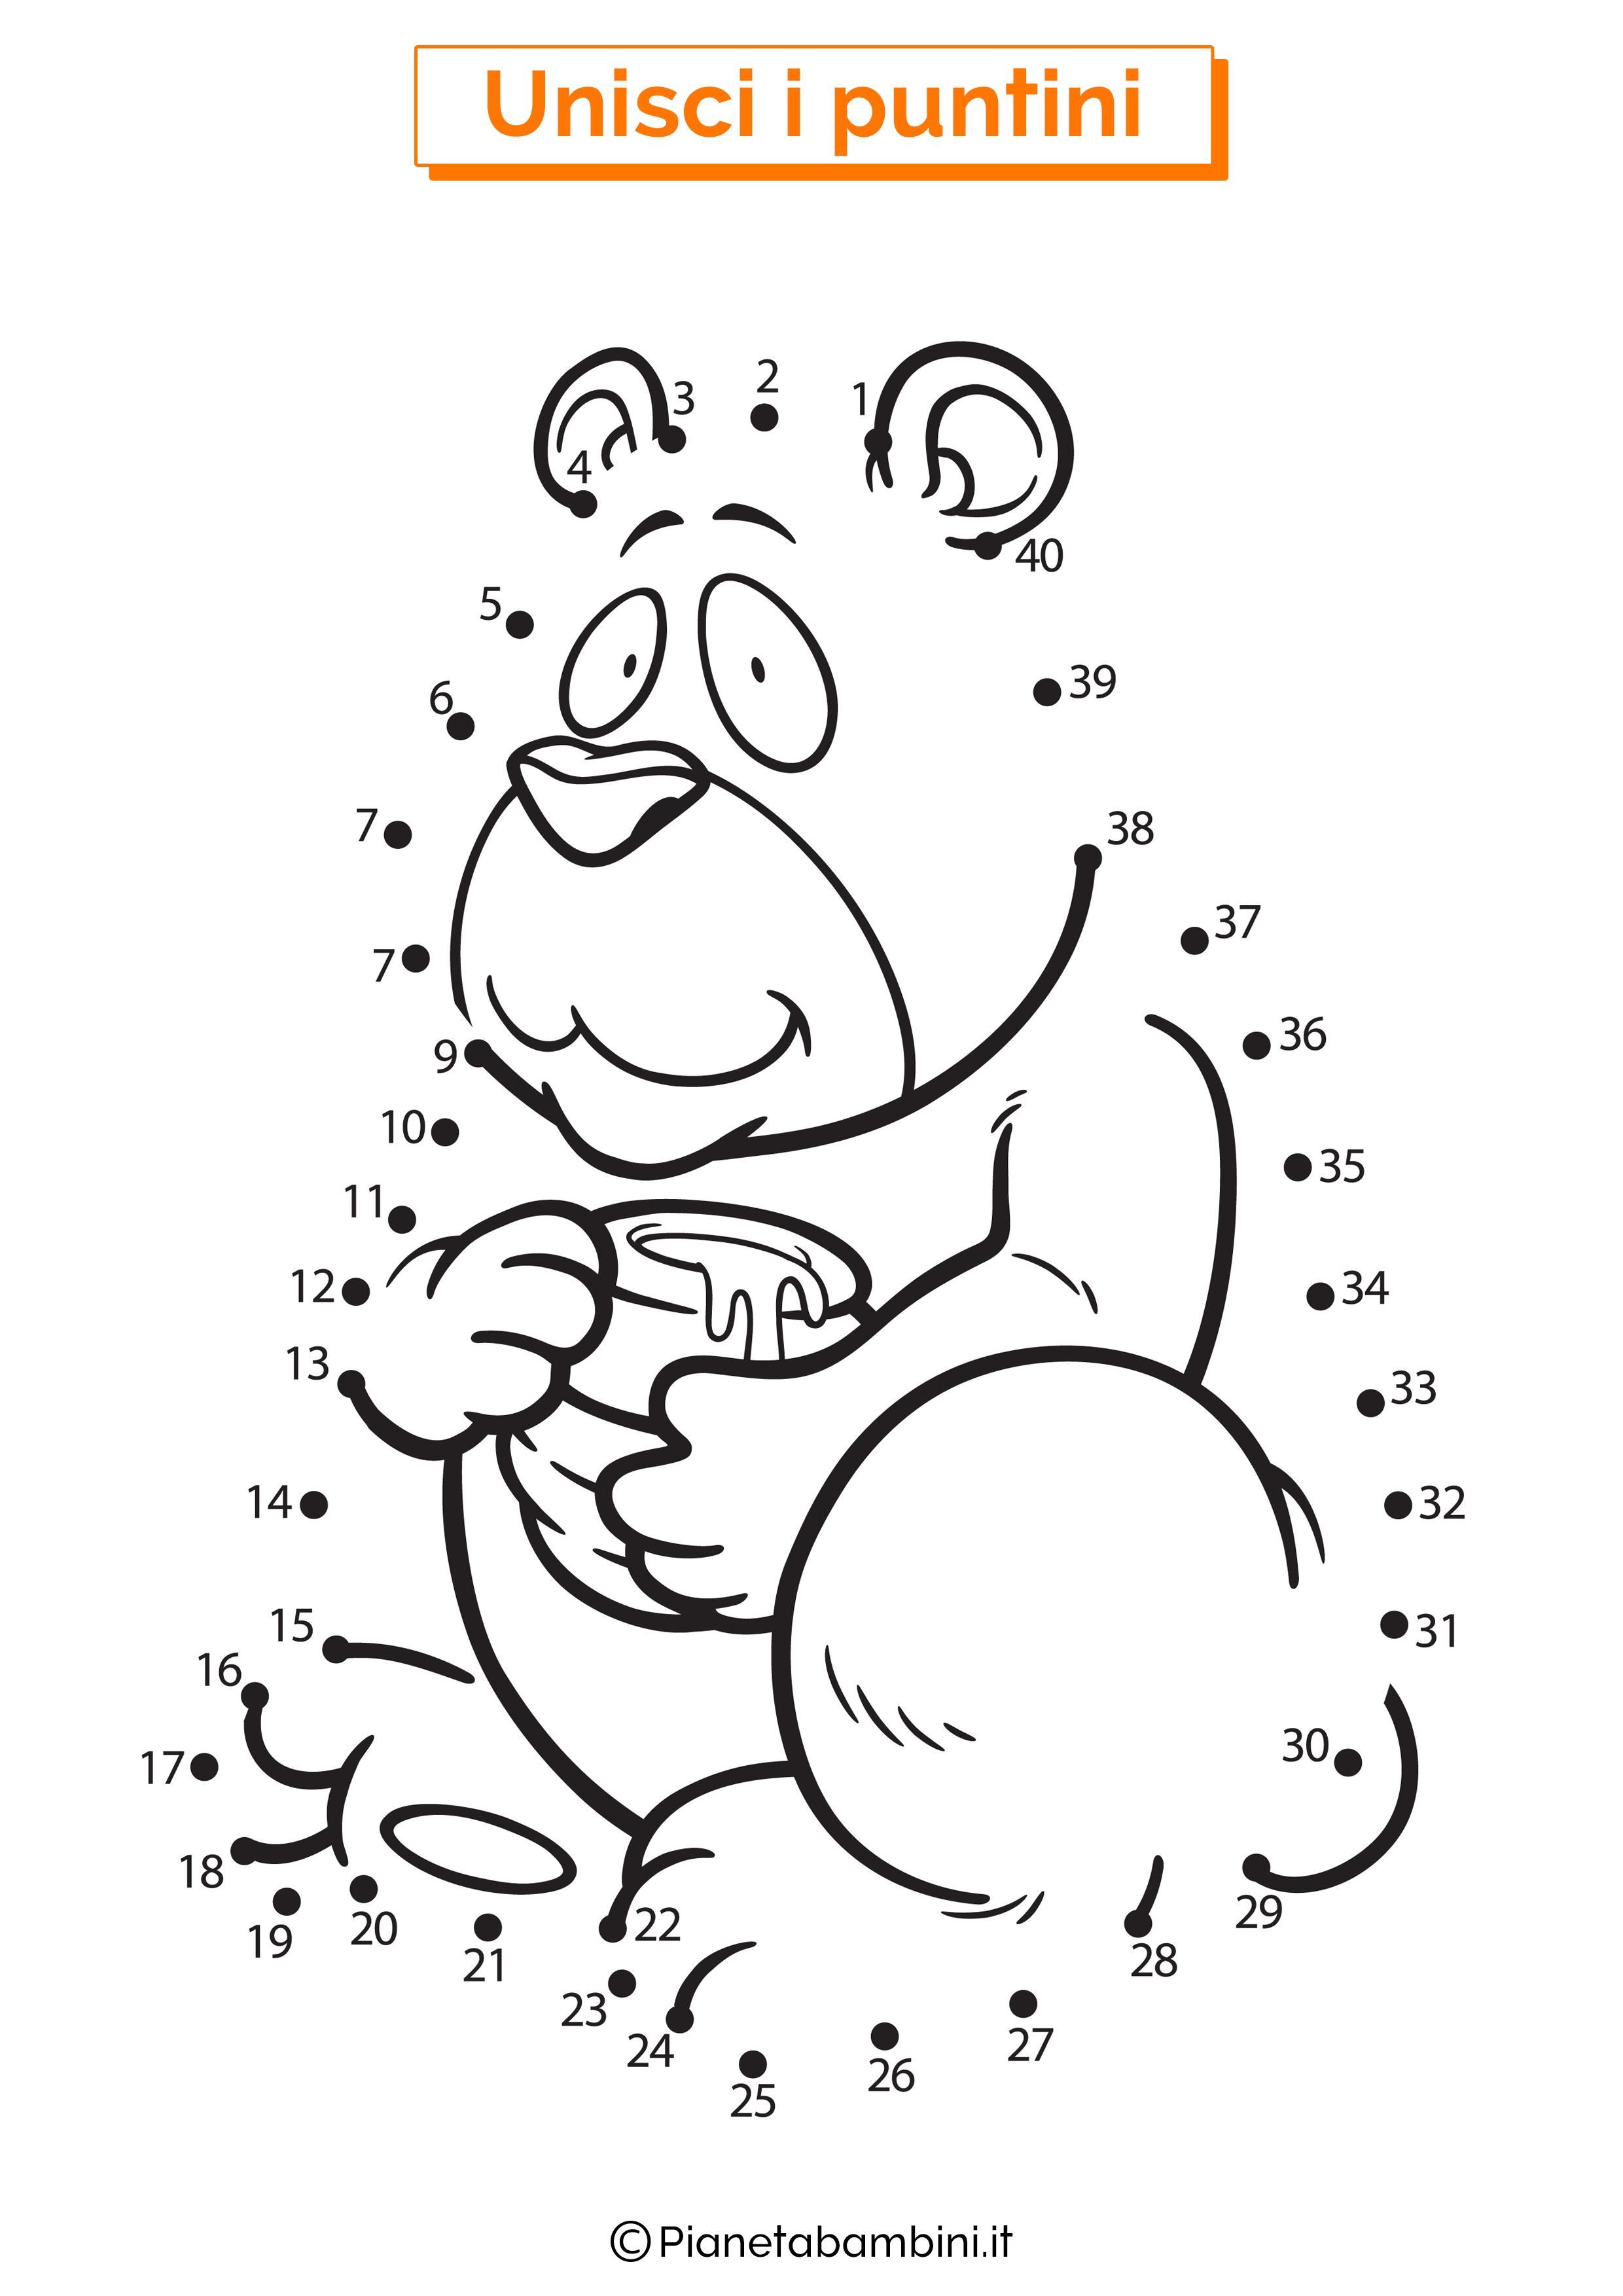 Disegno unisci i puntini 1-40 orso